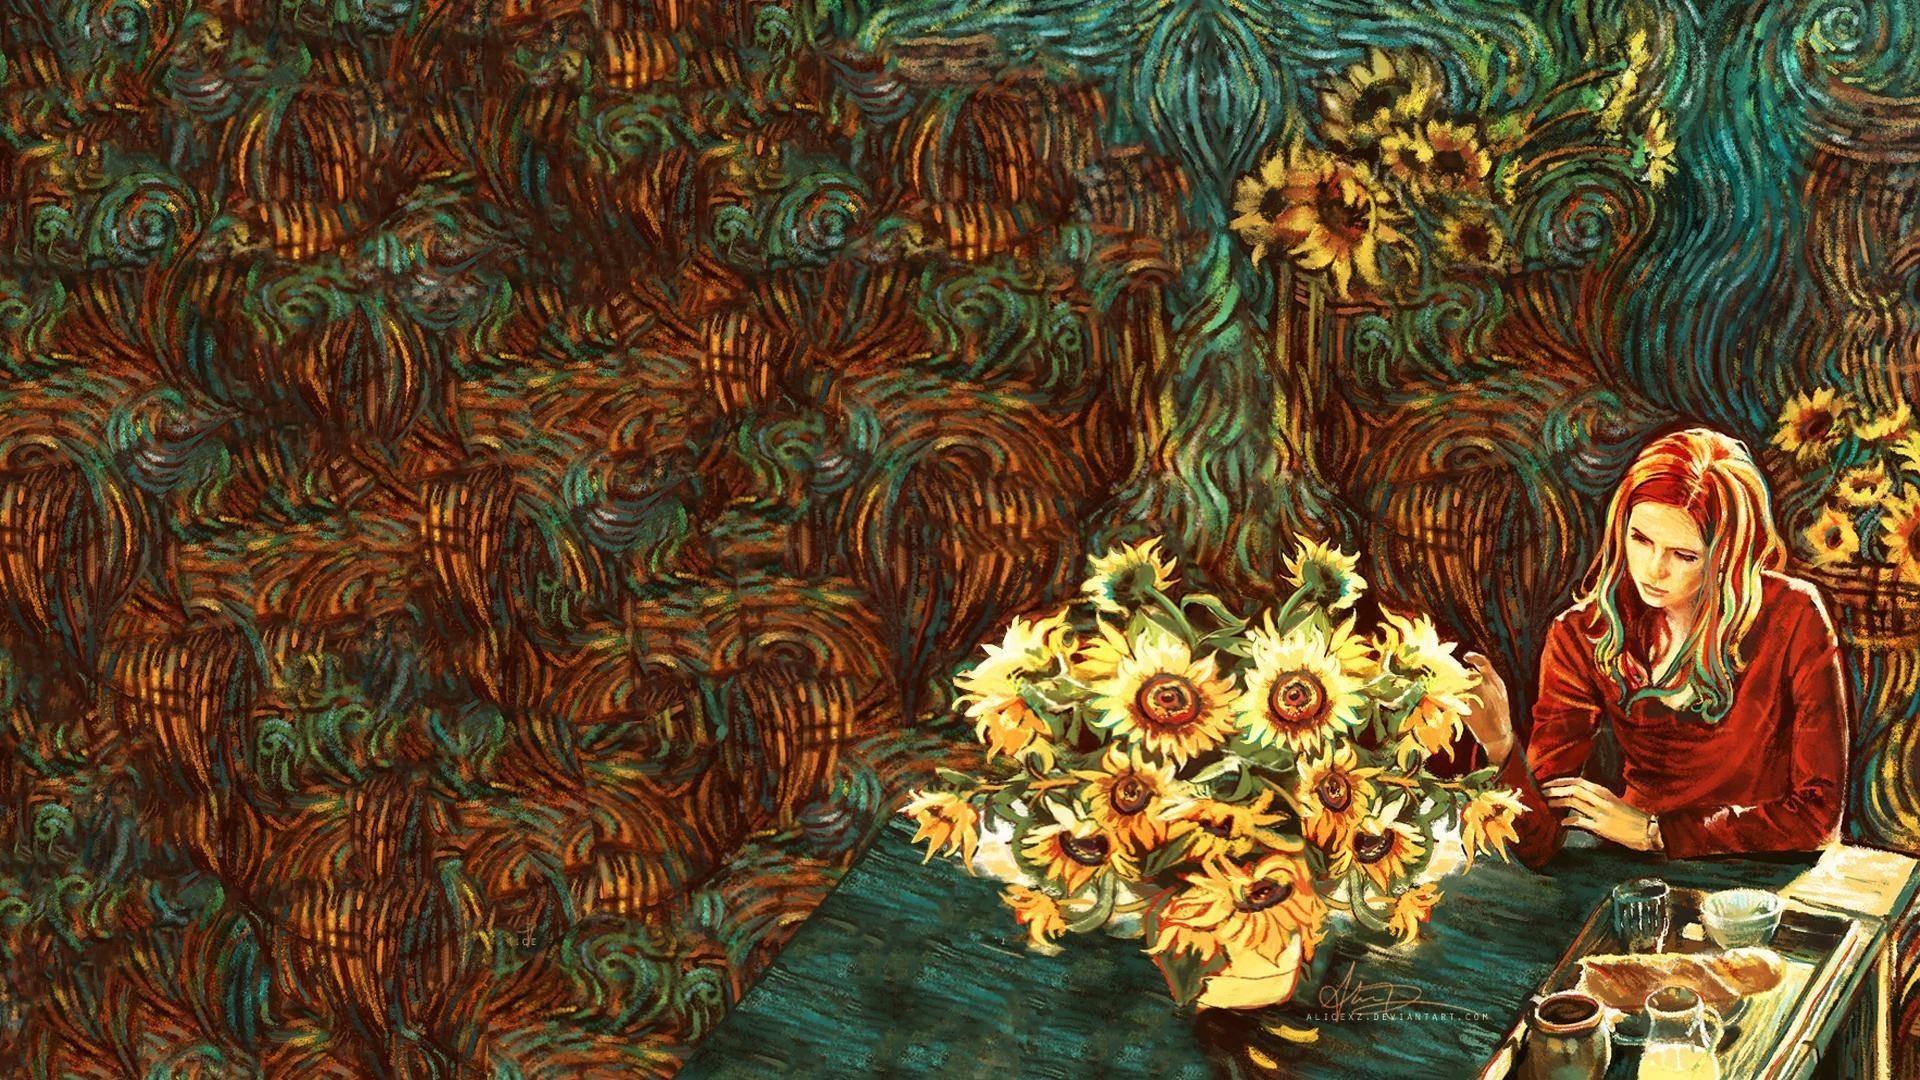 Van Gogh, Karen Gillan, Amy Pond, Doctor Who, sunflowers .